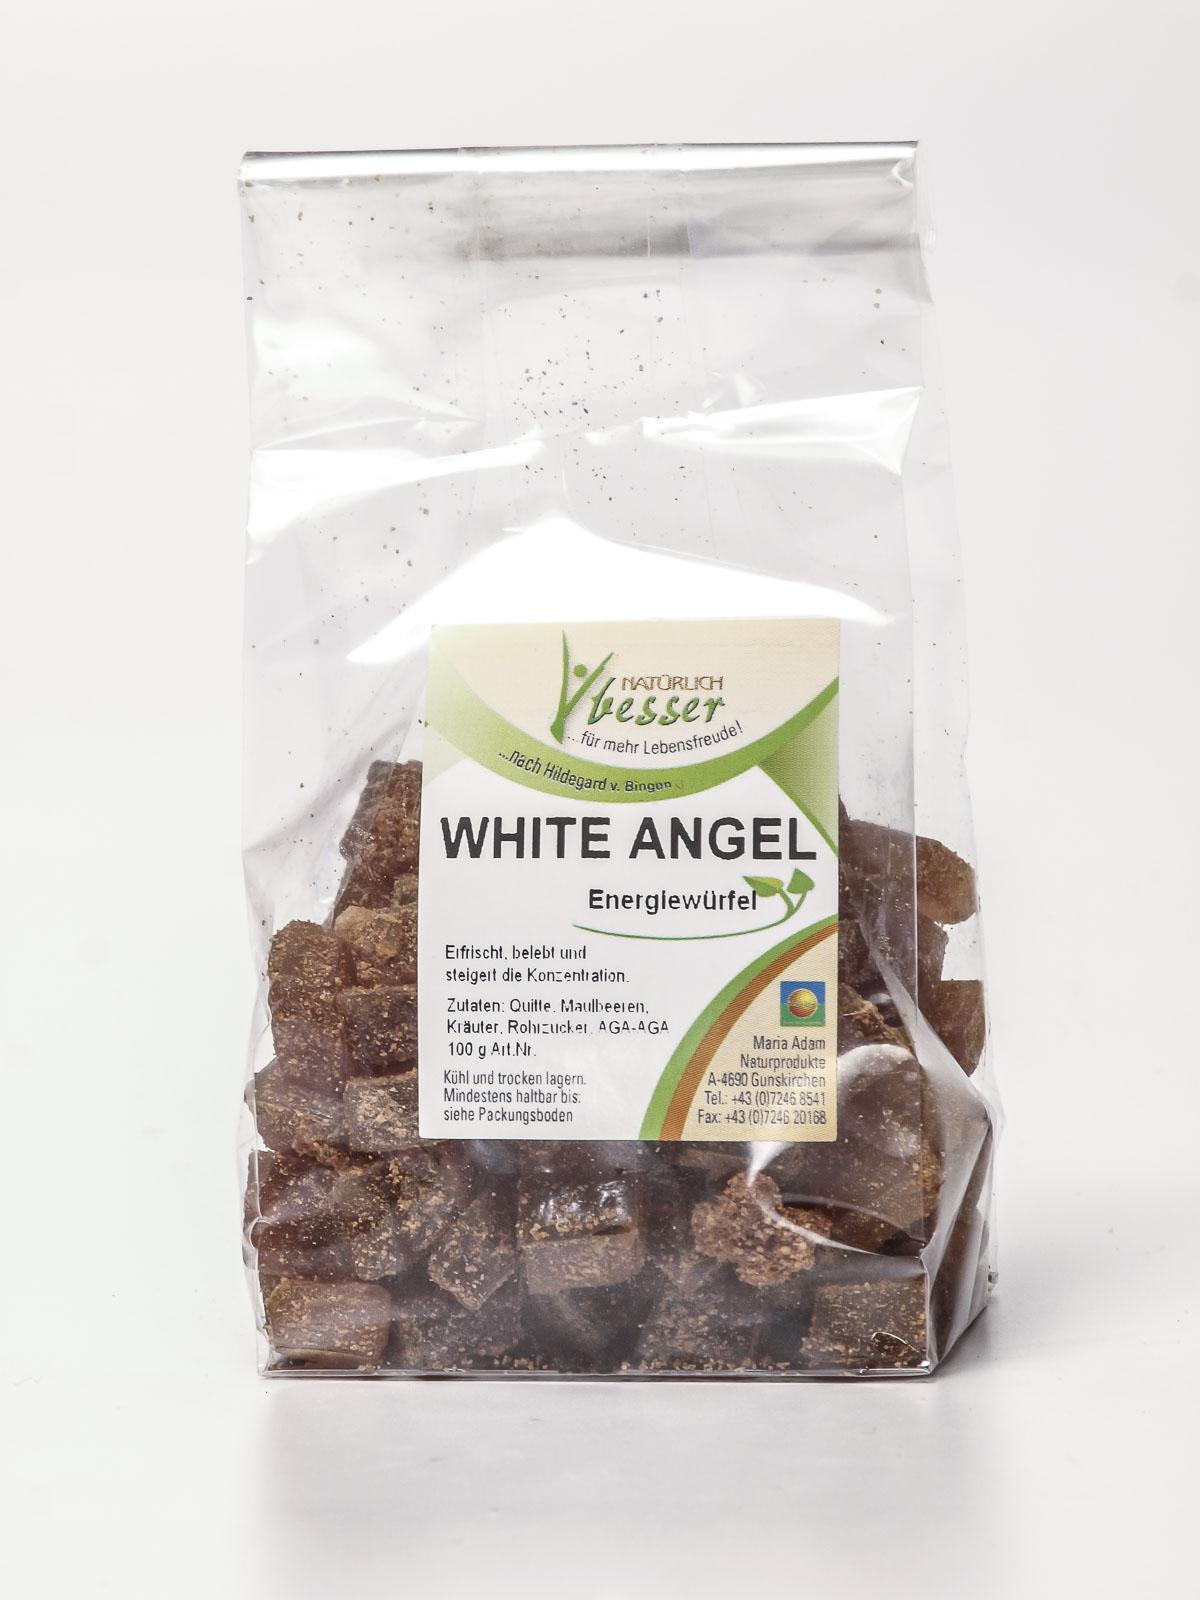 White Angel Energiewürfel